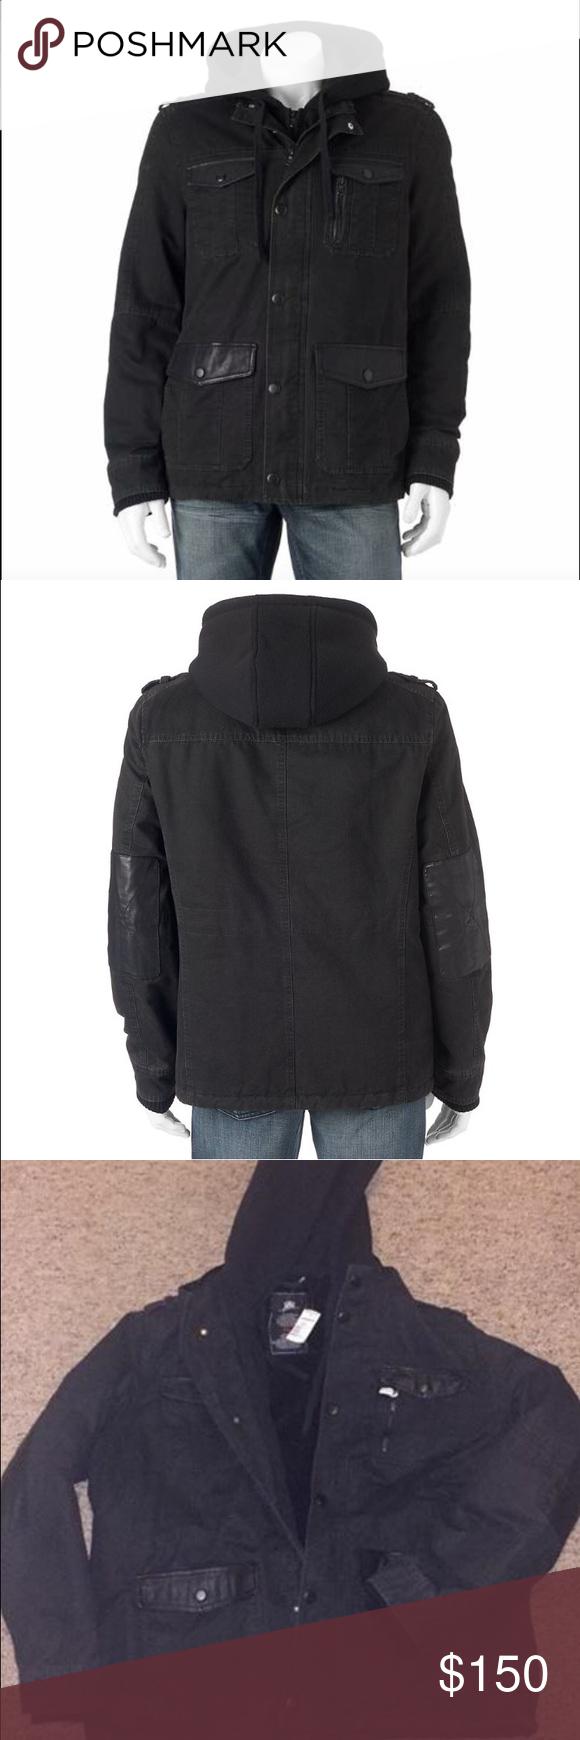 ❗️LOWEST❗️NWT Rock & republic winter coat Brand new rock & republic winter coat. 100% cotton, faux leather, and faux fur interior. Double zipper with hood. Size xxl mens. Rock & Republic Jackets & Coats